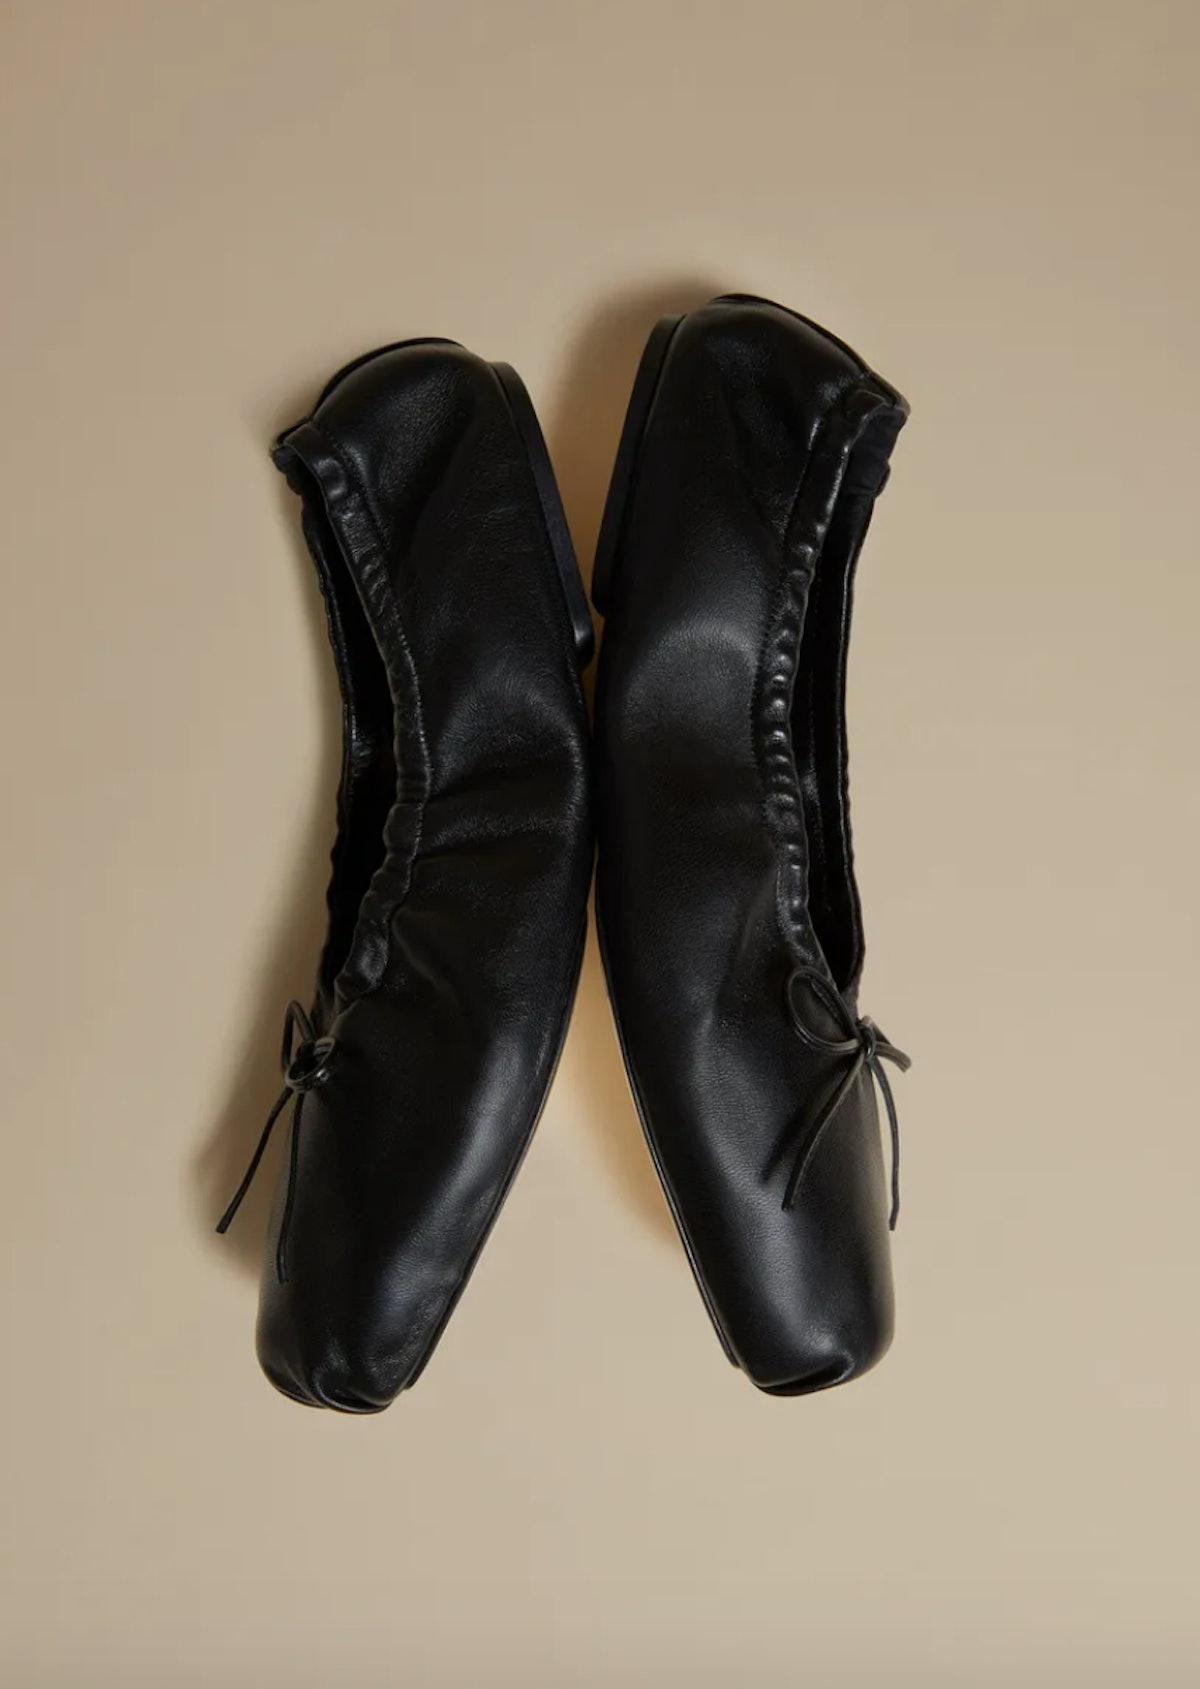 khaite black ballet flats